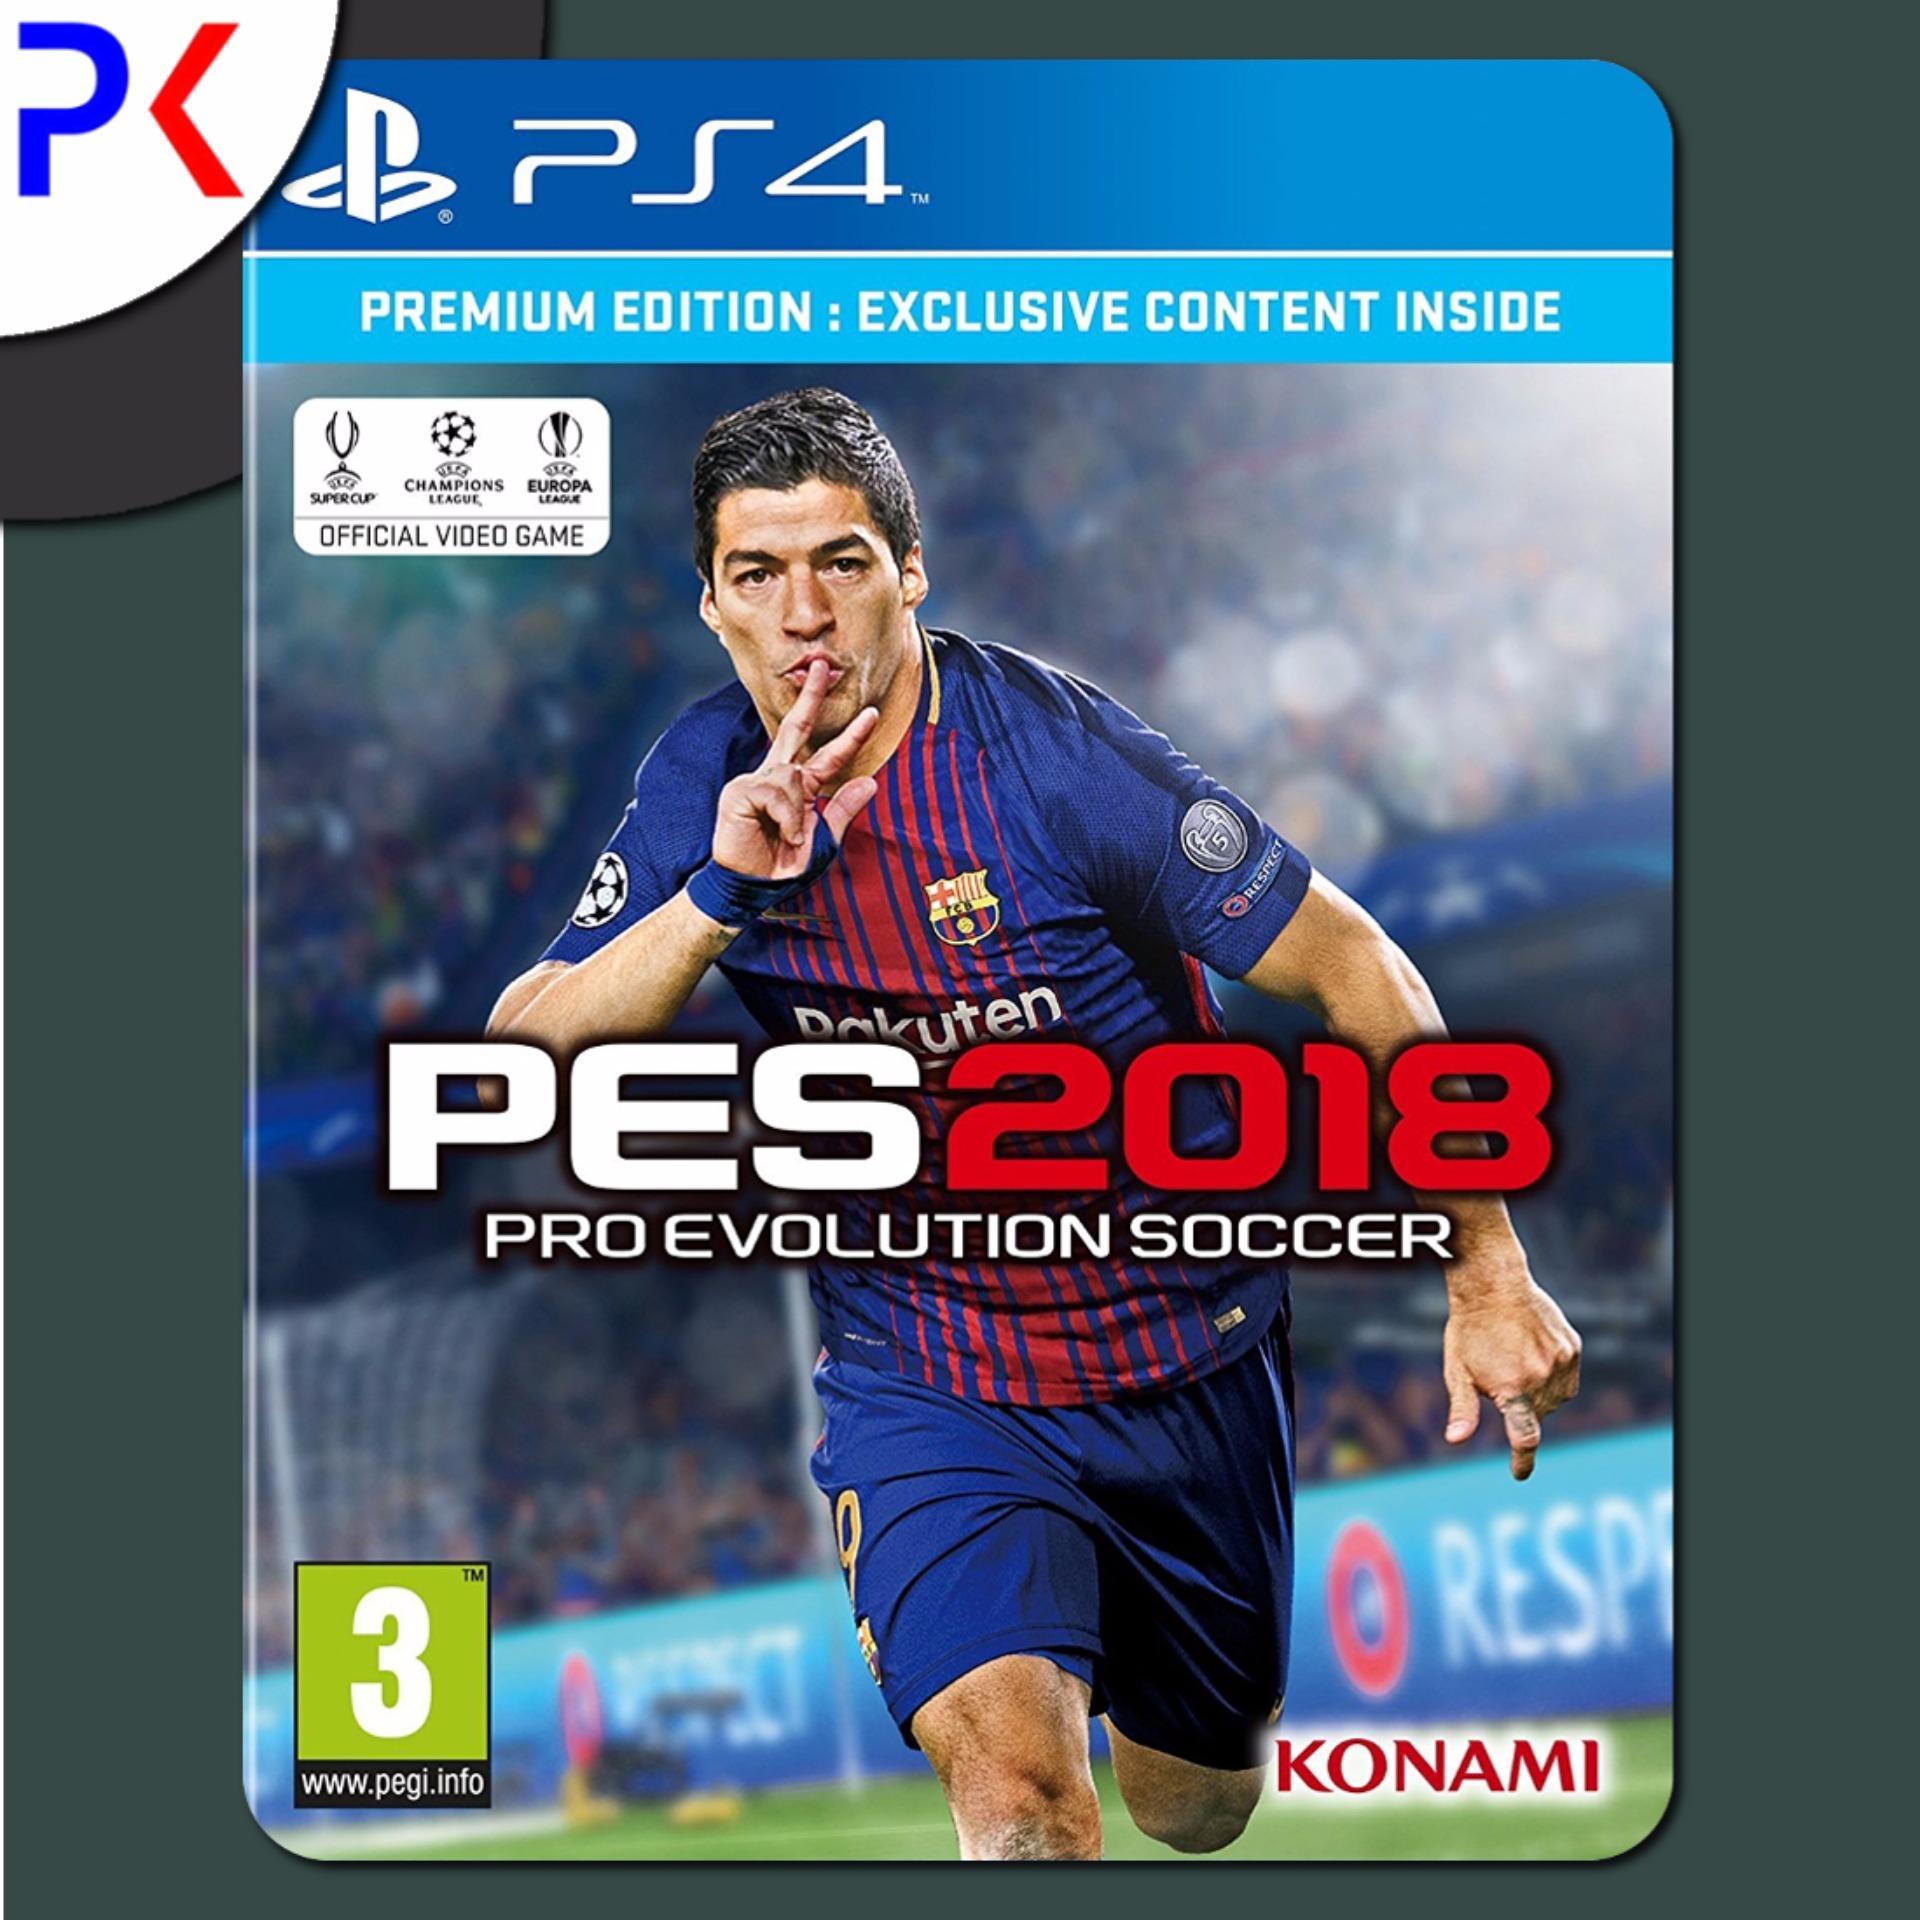 PS4 Pro Evolution Soccer 2018 Premium Edition (R2)